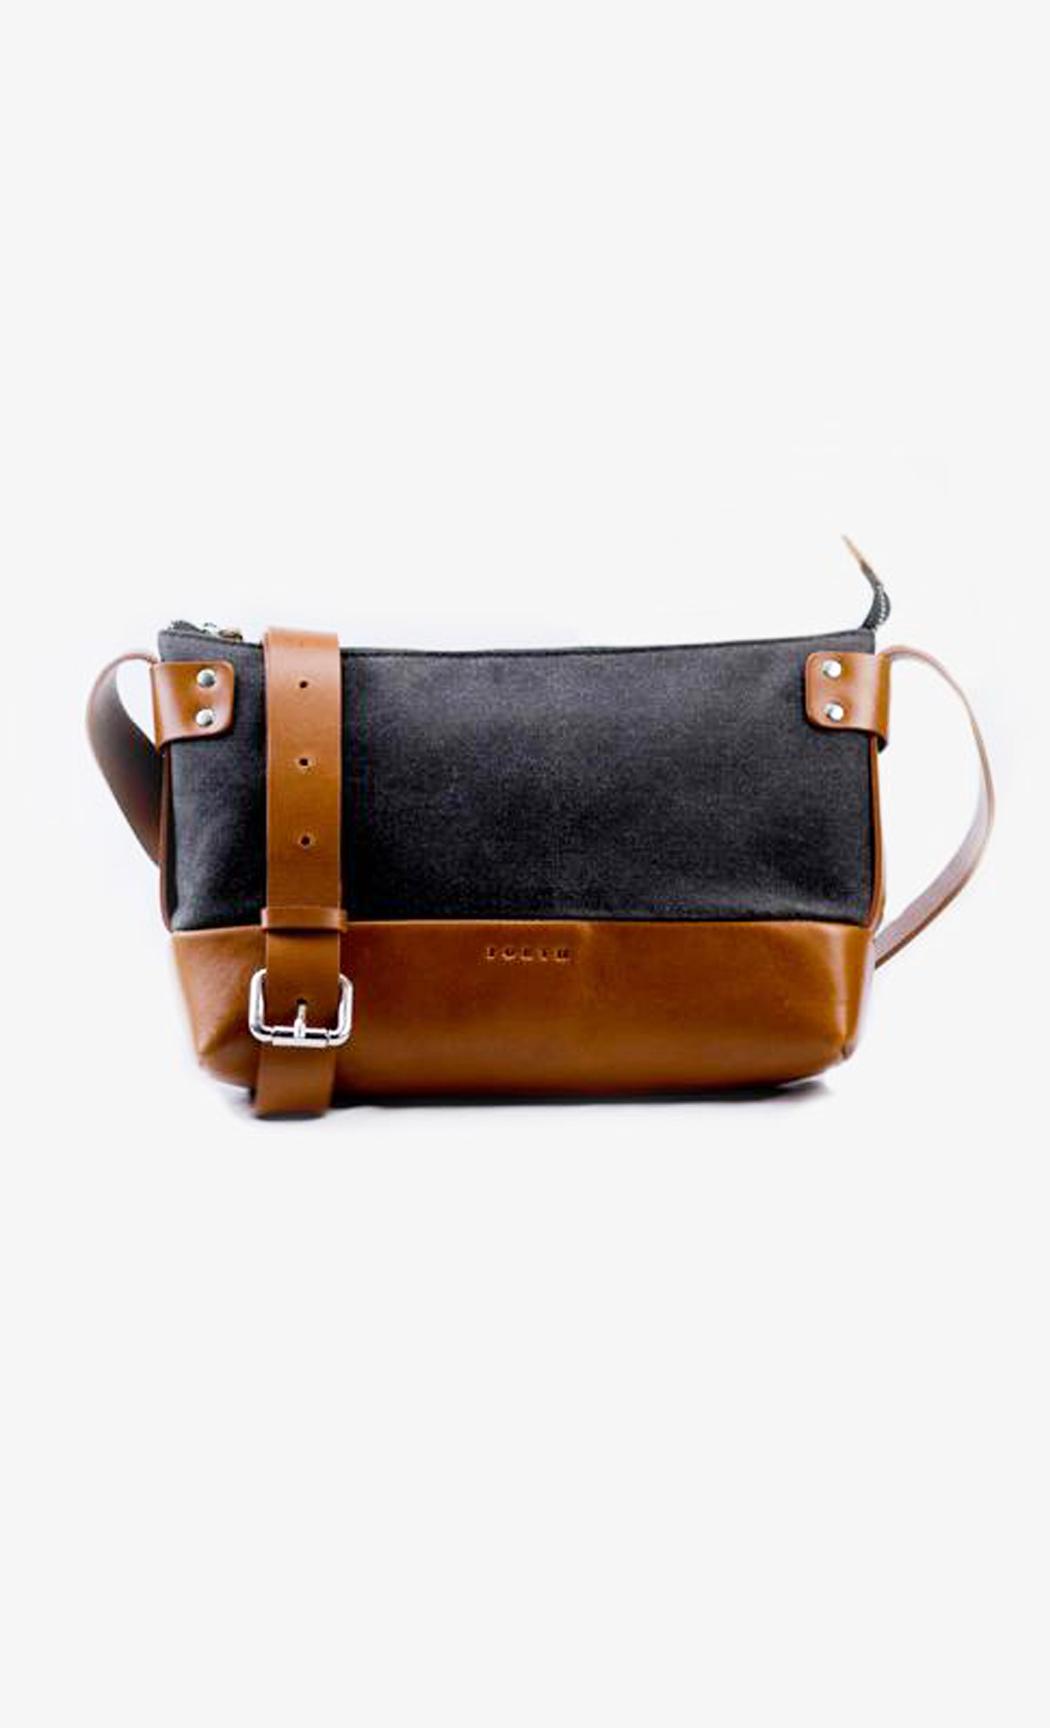 Grey and Black Women's Weekend Leather Sling Bag. Buy Online